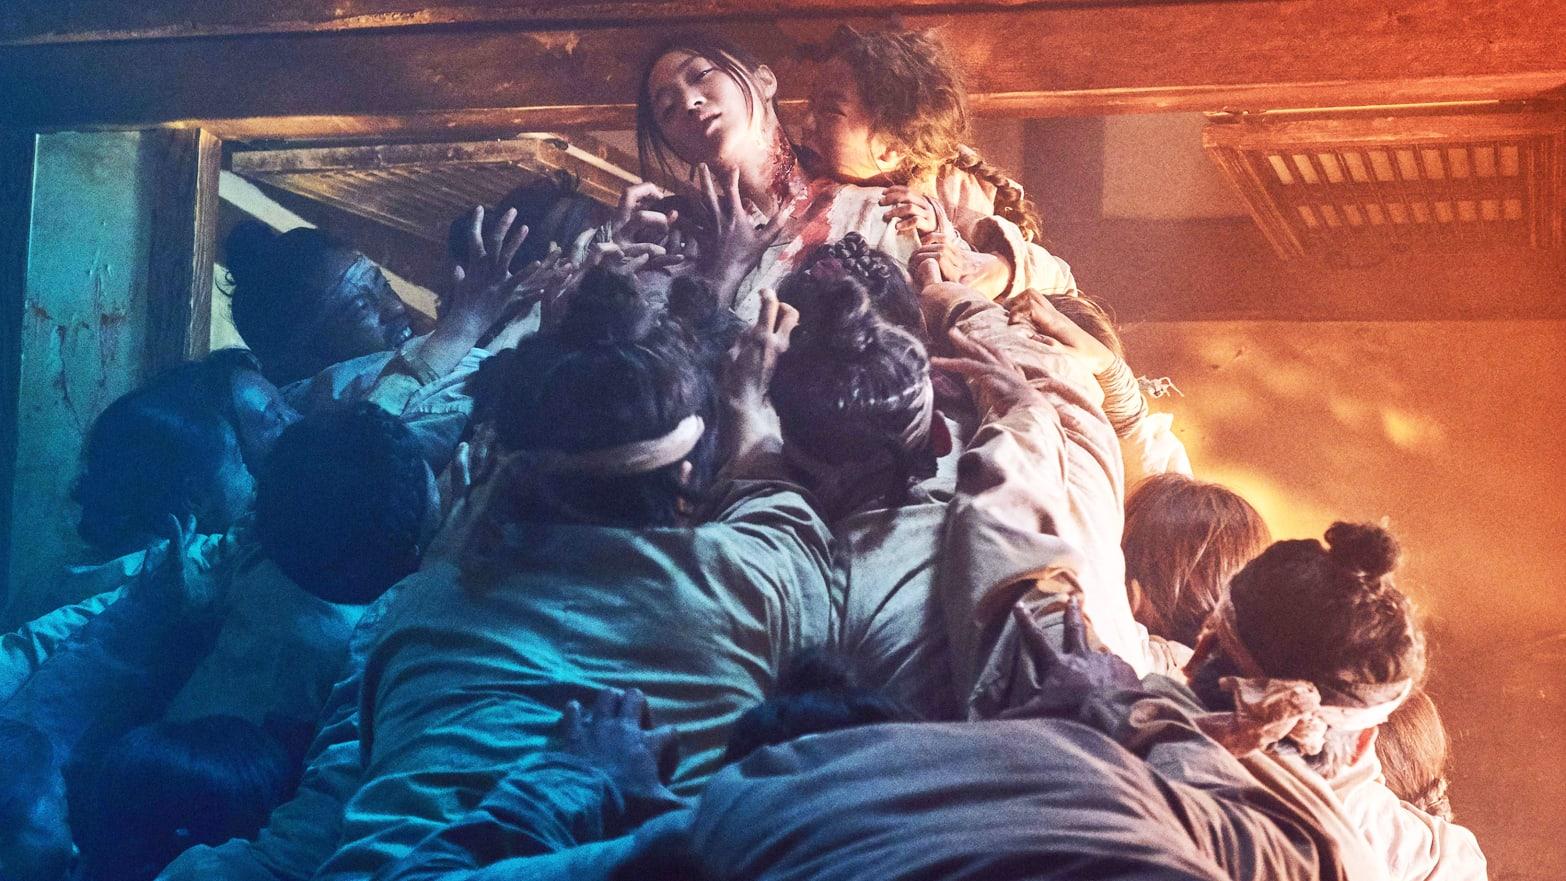 Netflix S Kingdom An Insane Korean Zombie Epic That Puts The